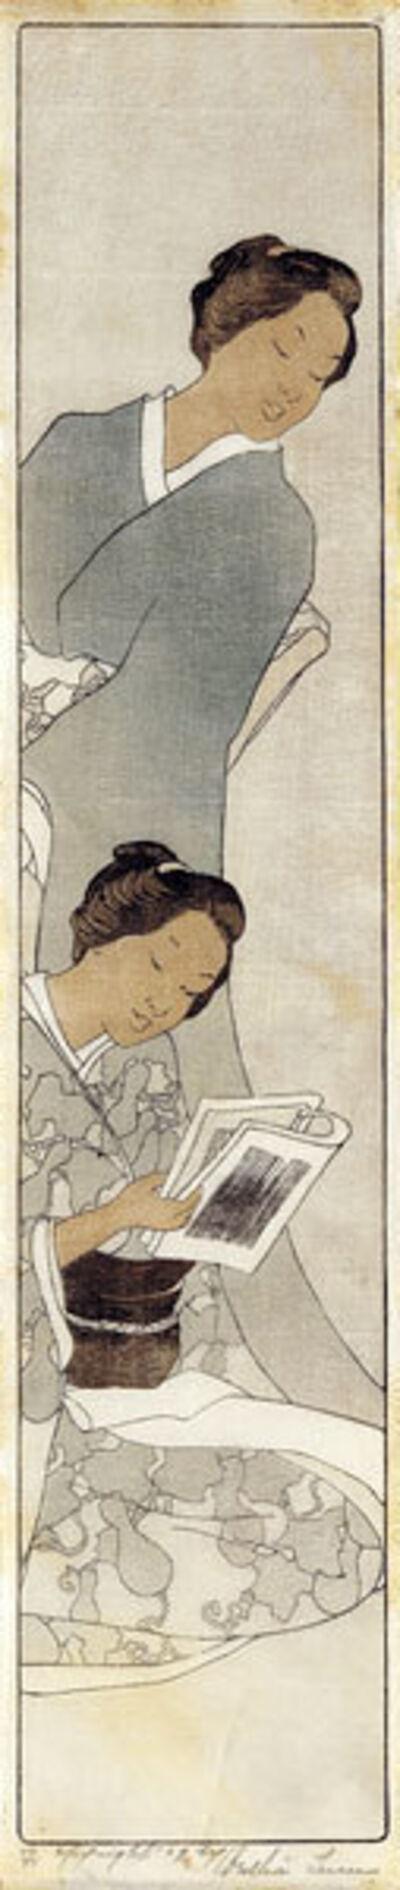 Bertha Lum, 'Sisters', ca. 1907